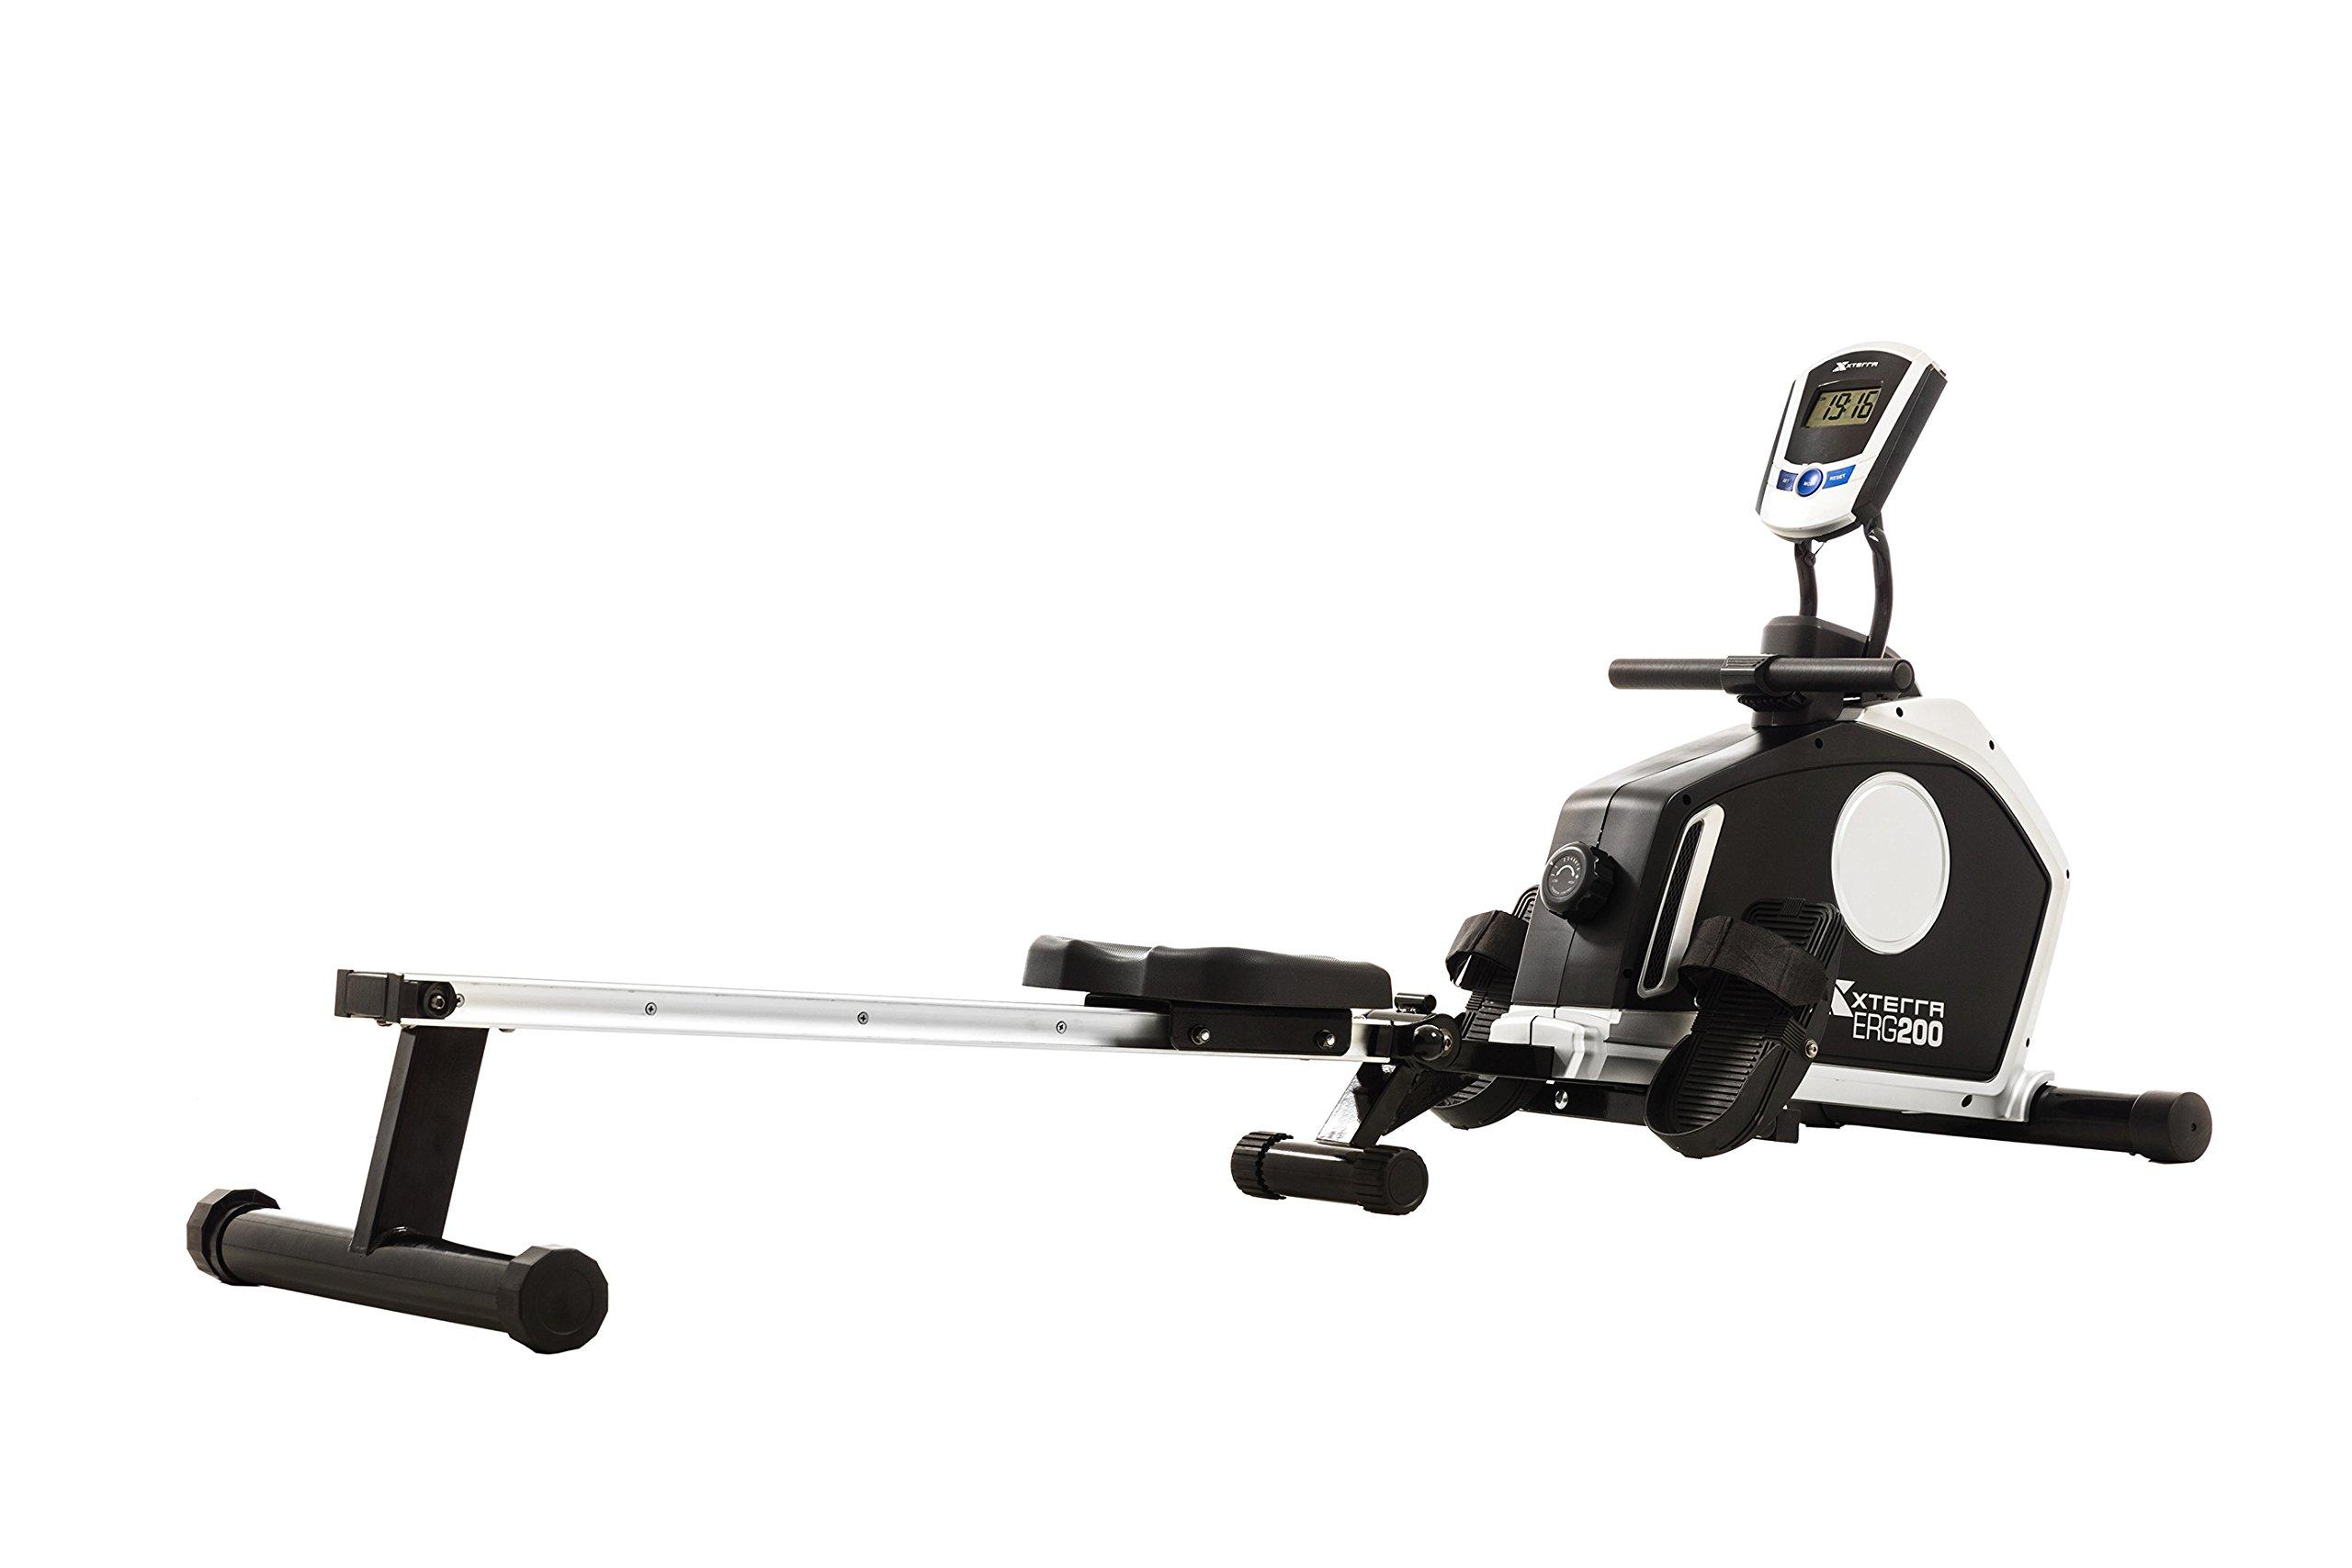 XTERRA ERG200 Folding Magnetic Resistance Rower